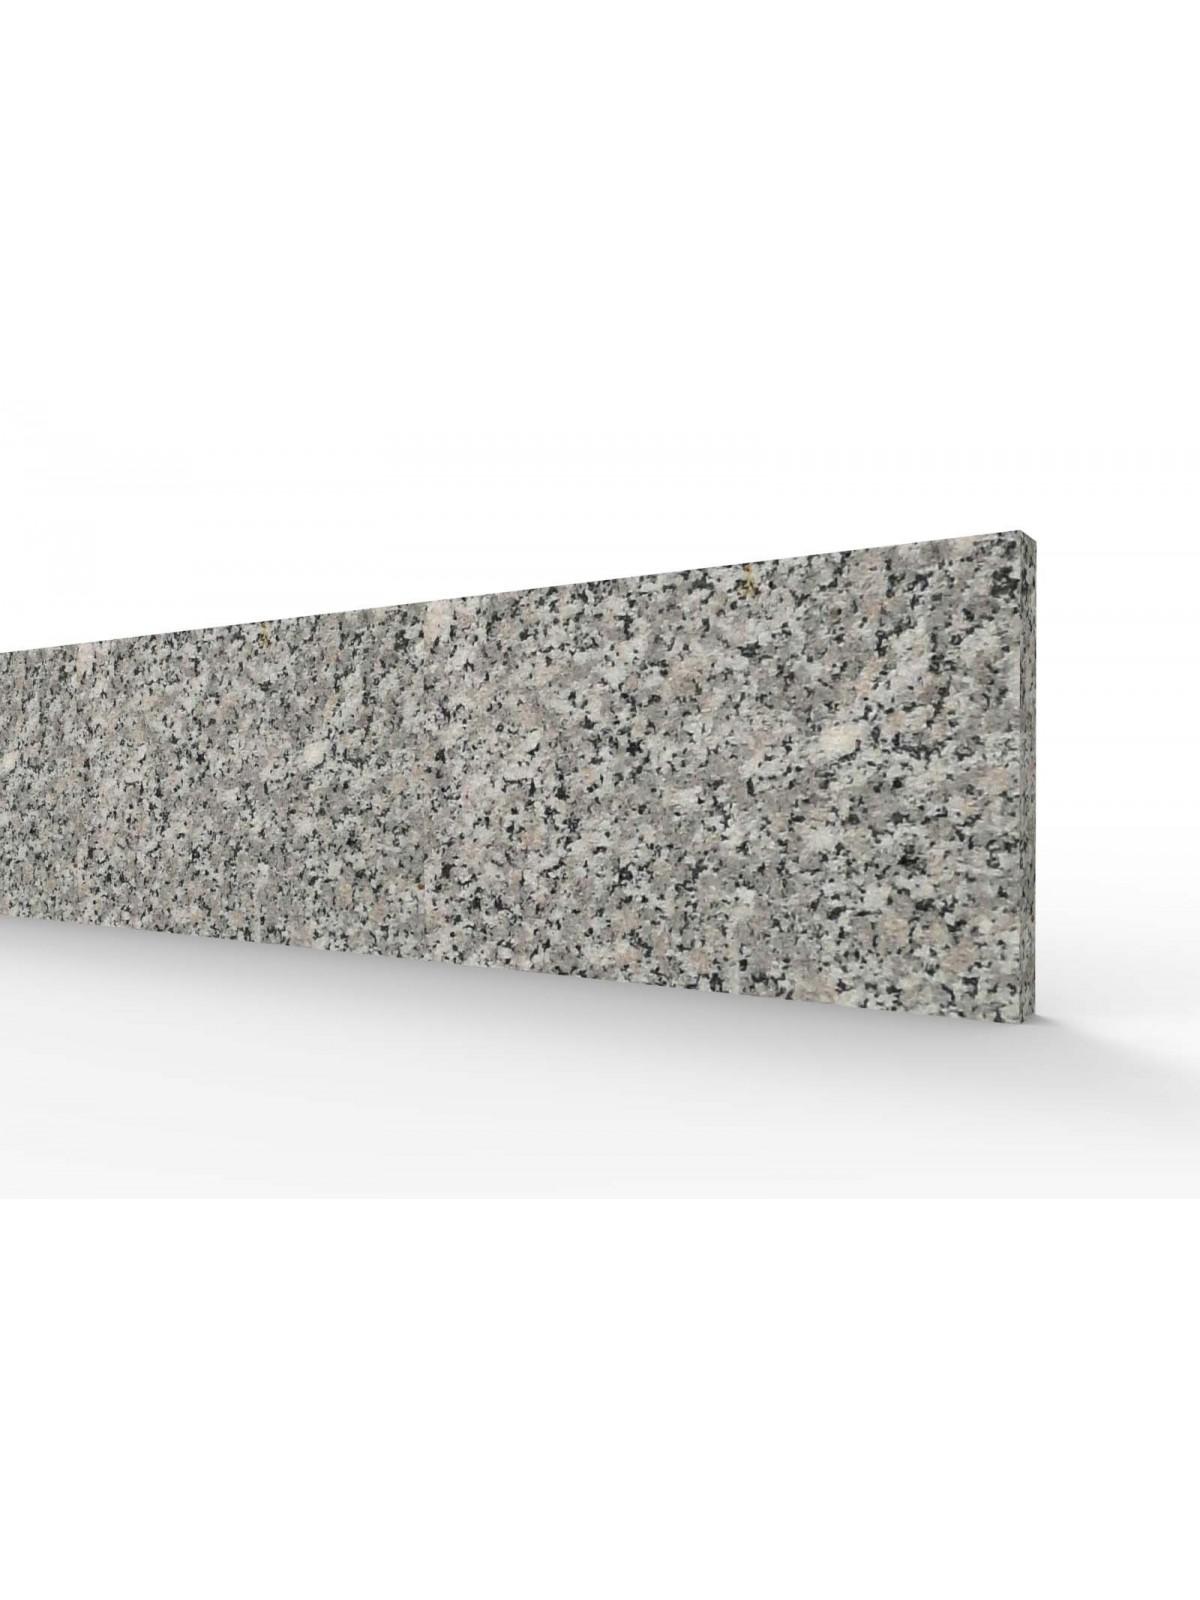 Granit Treppenaufsatz I Rosa Sardo Beta